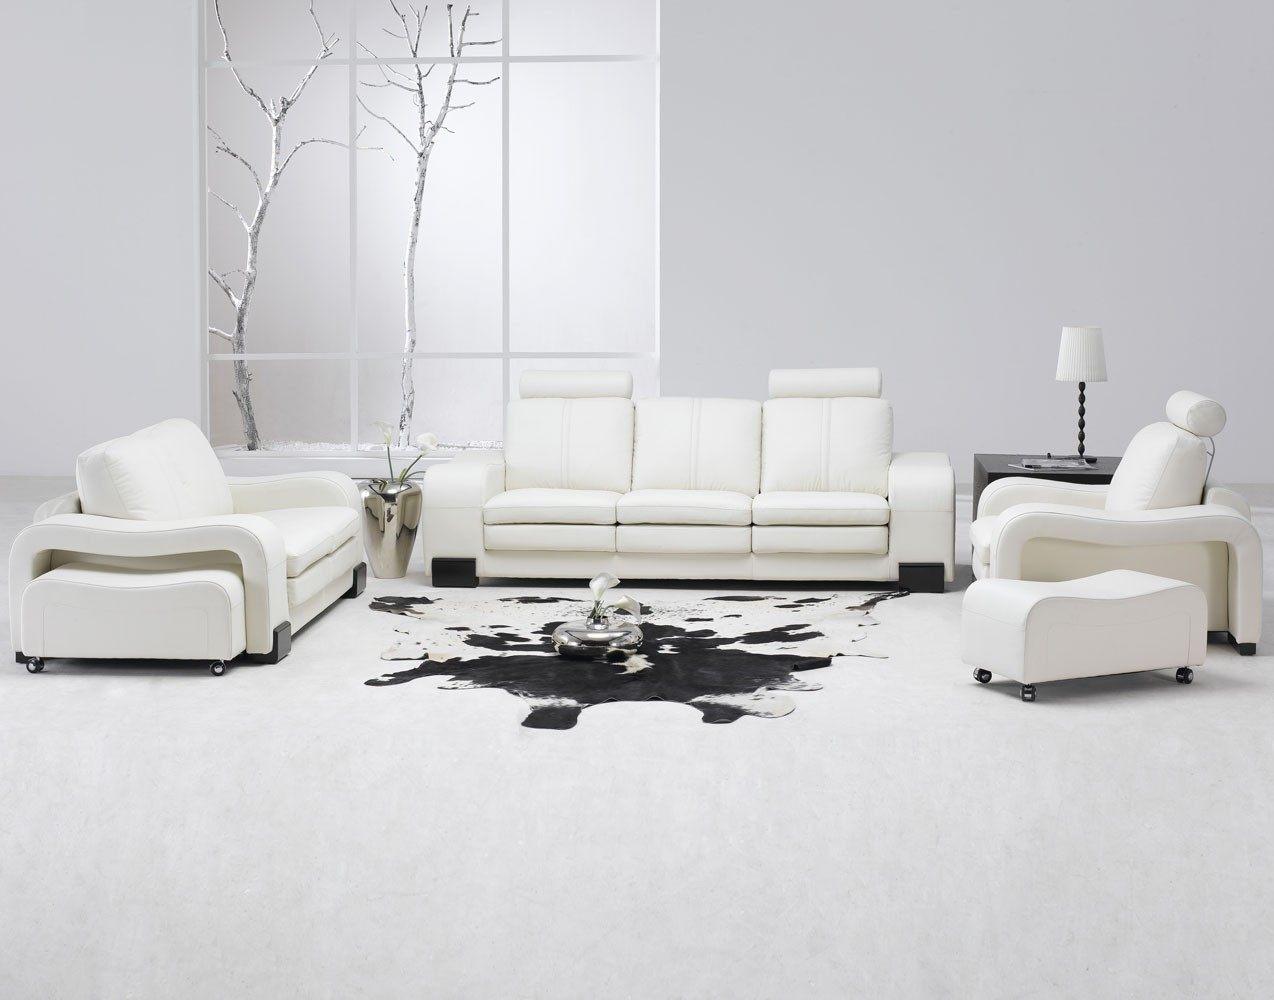 Salas minimalistas for White furniture interior design